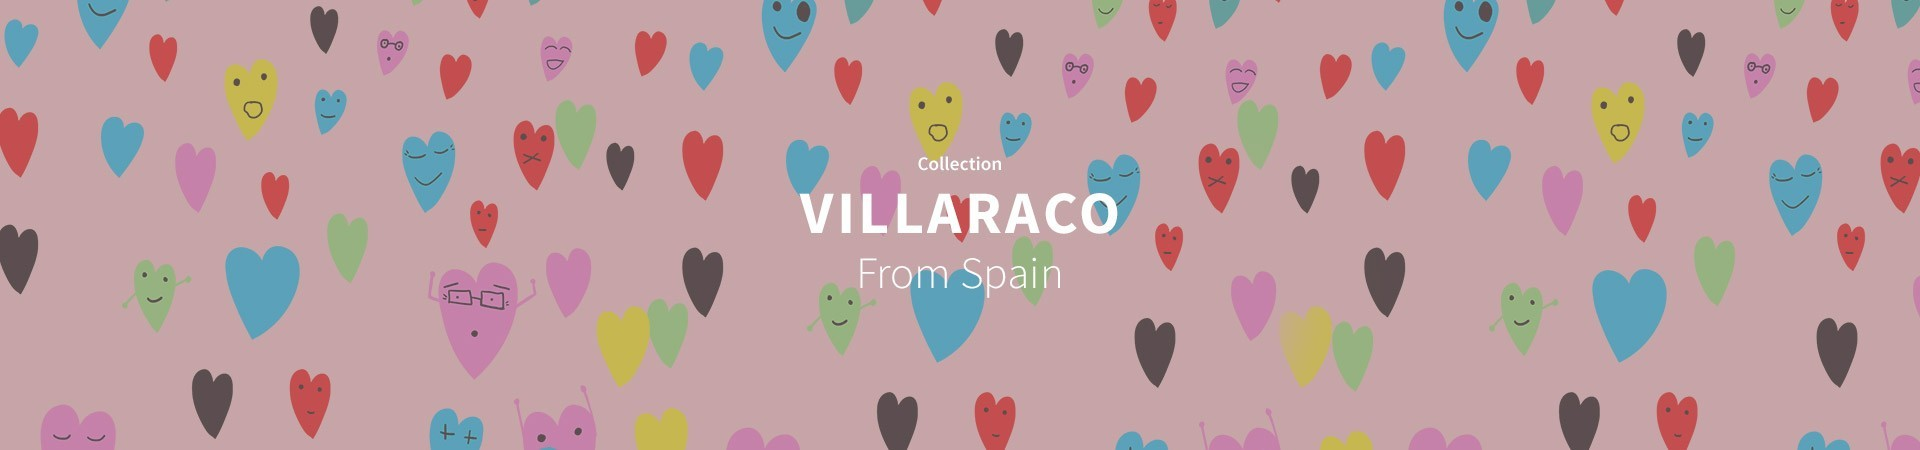 Villaraco